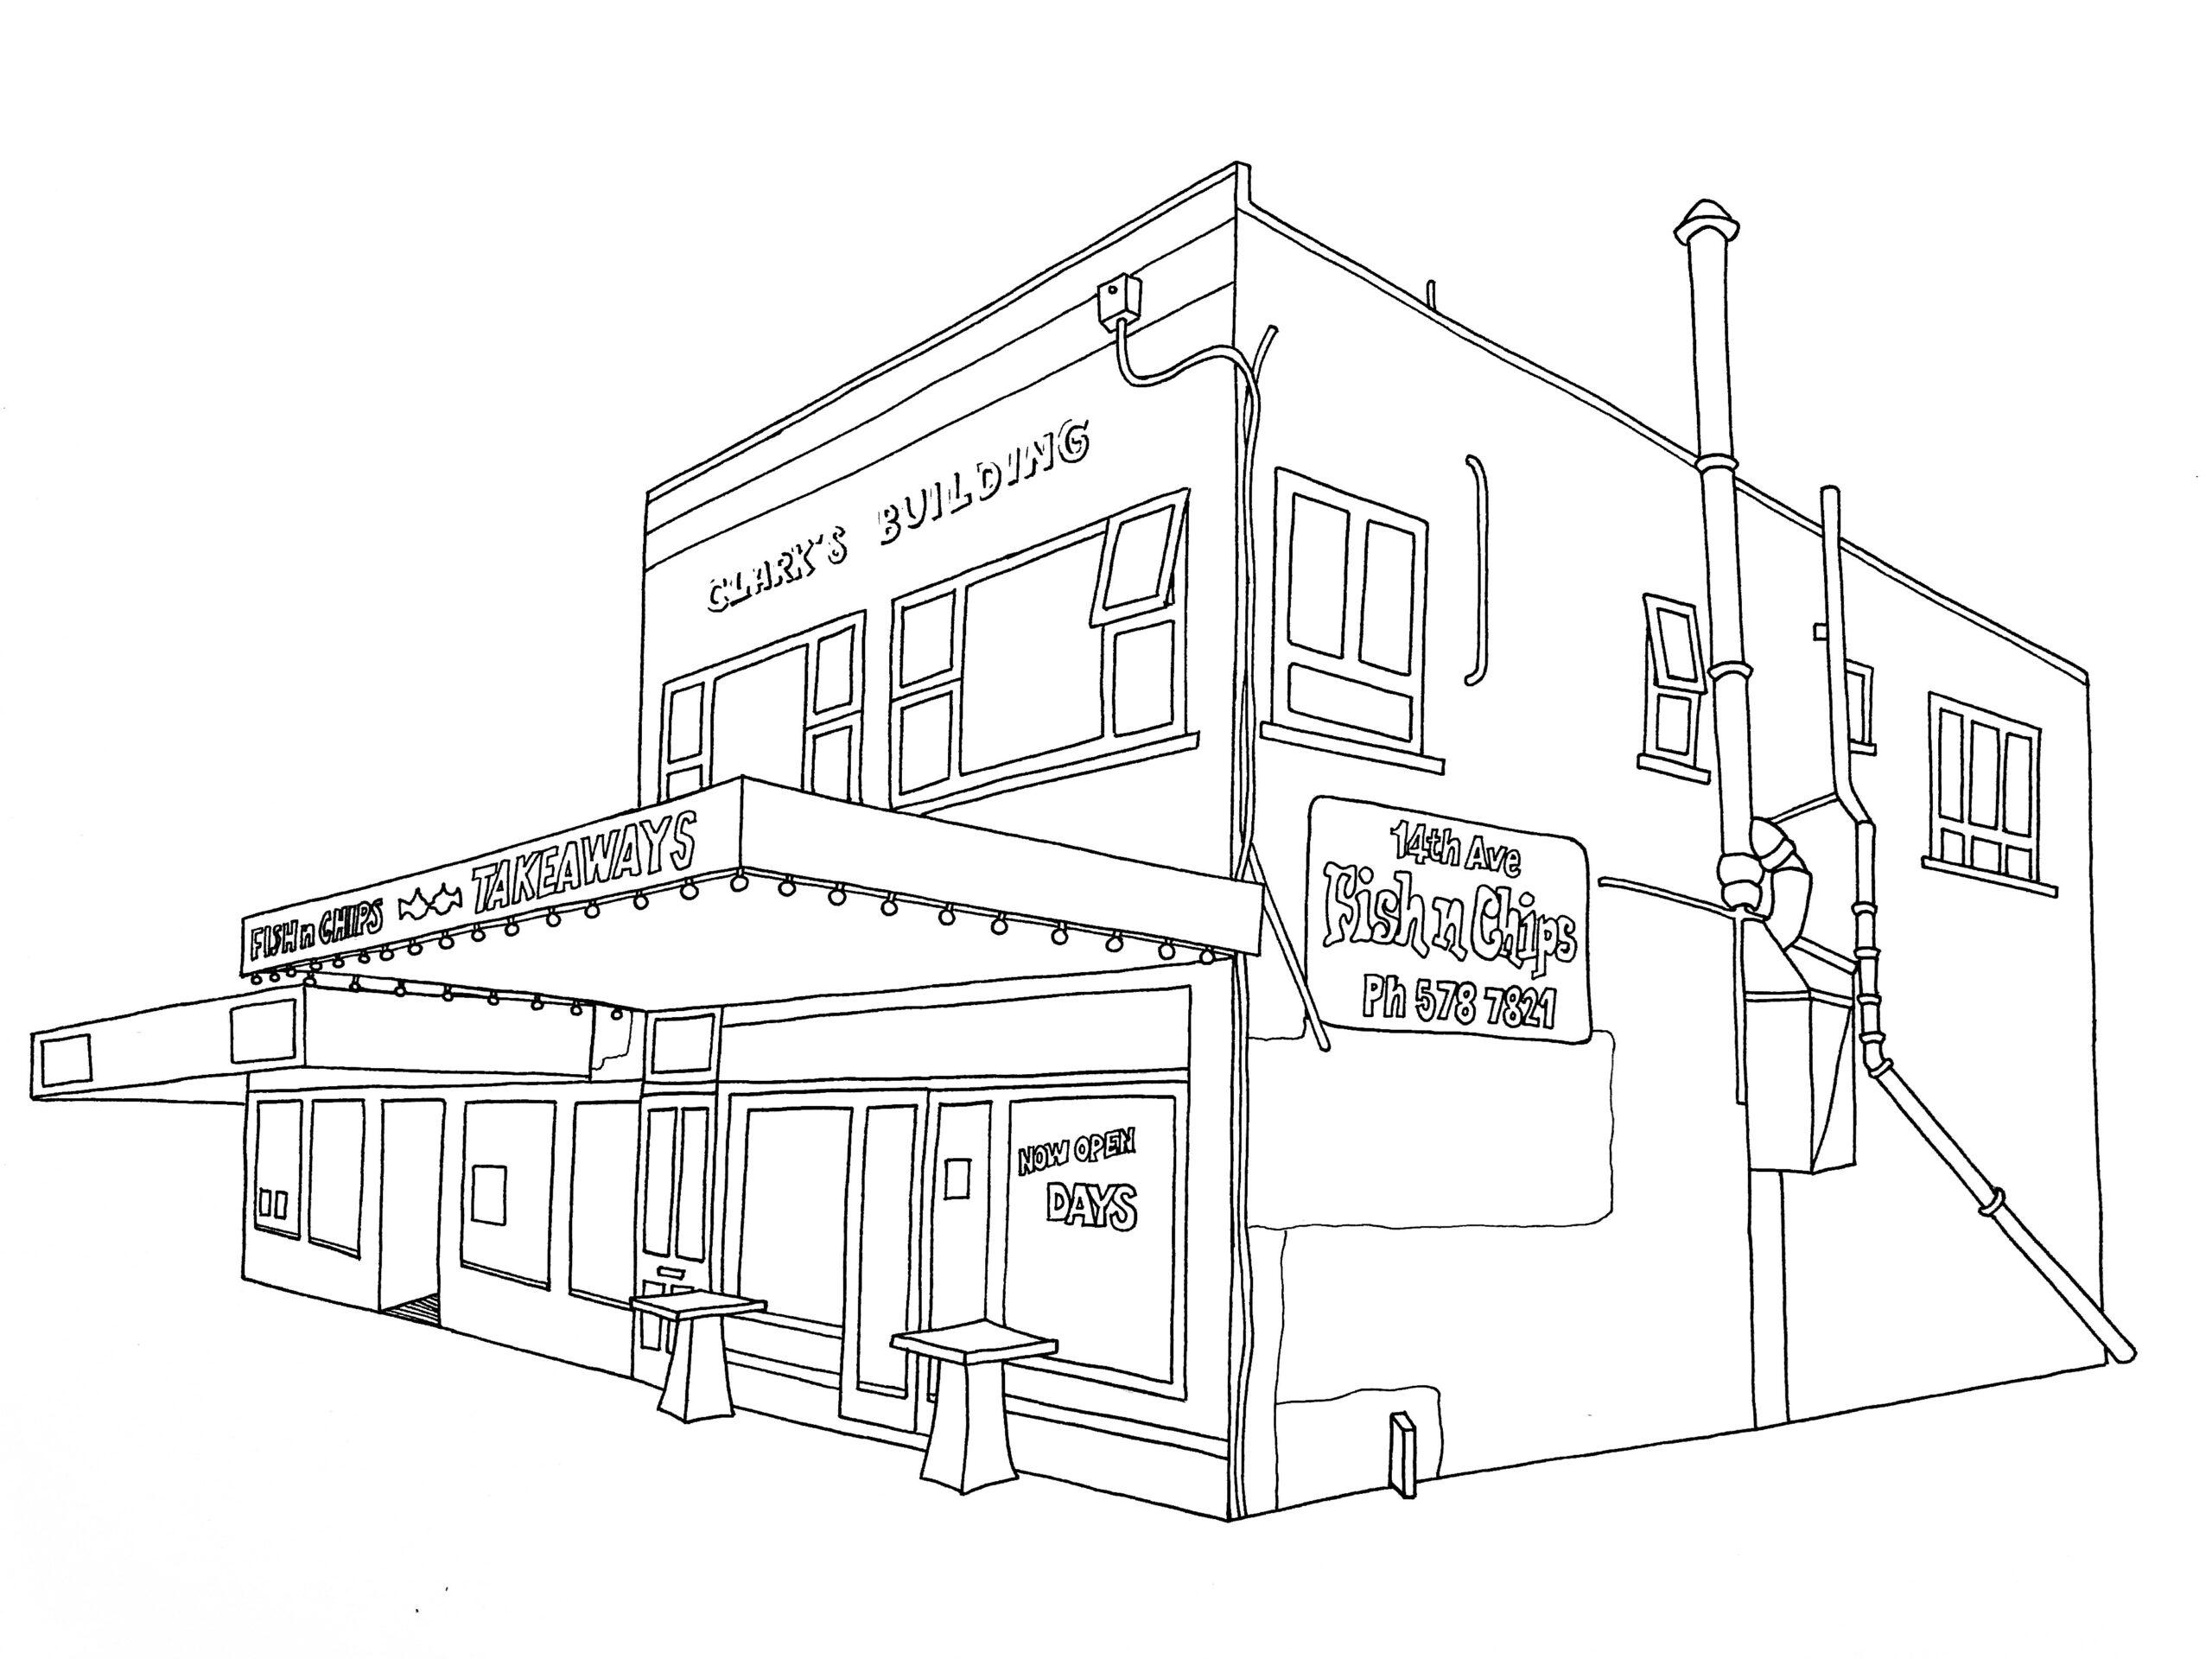 '14 Ave Fish & Chips' Kalou Koefoed, Illustration $390